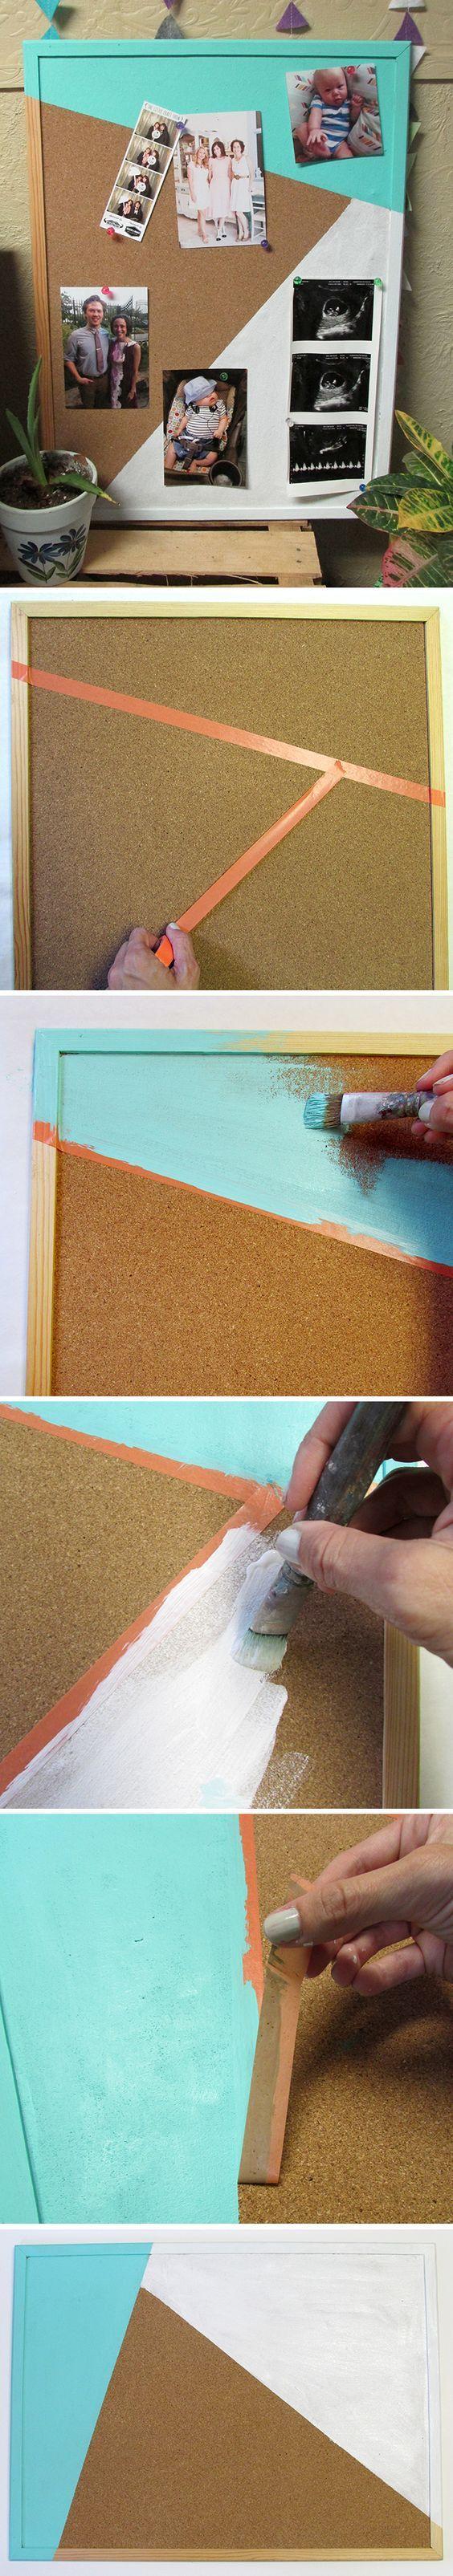 Best 25 Decorate Corkboard Ideas On Pinterest Cork